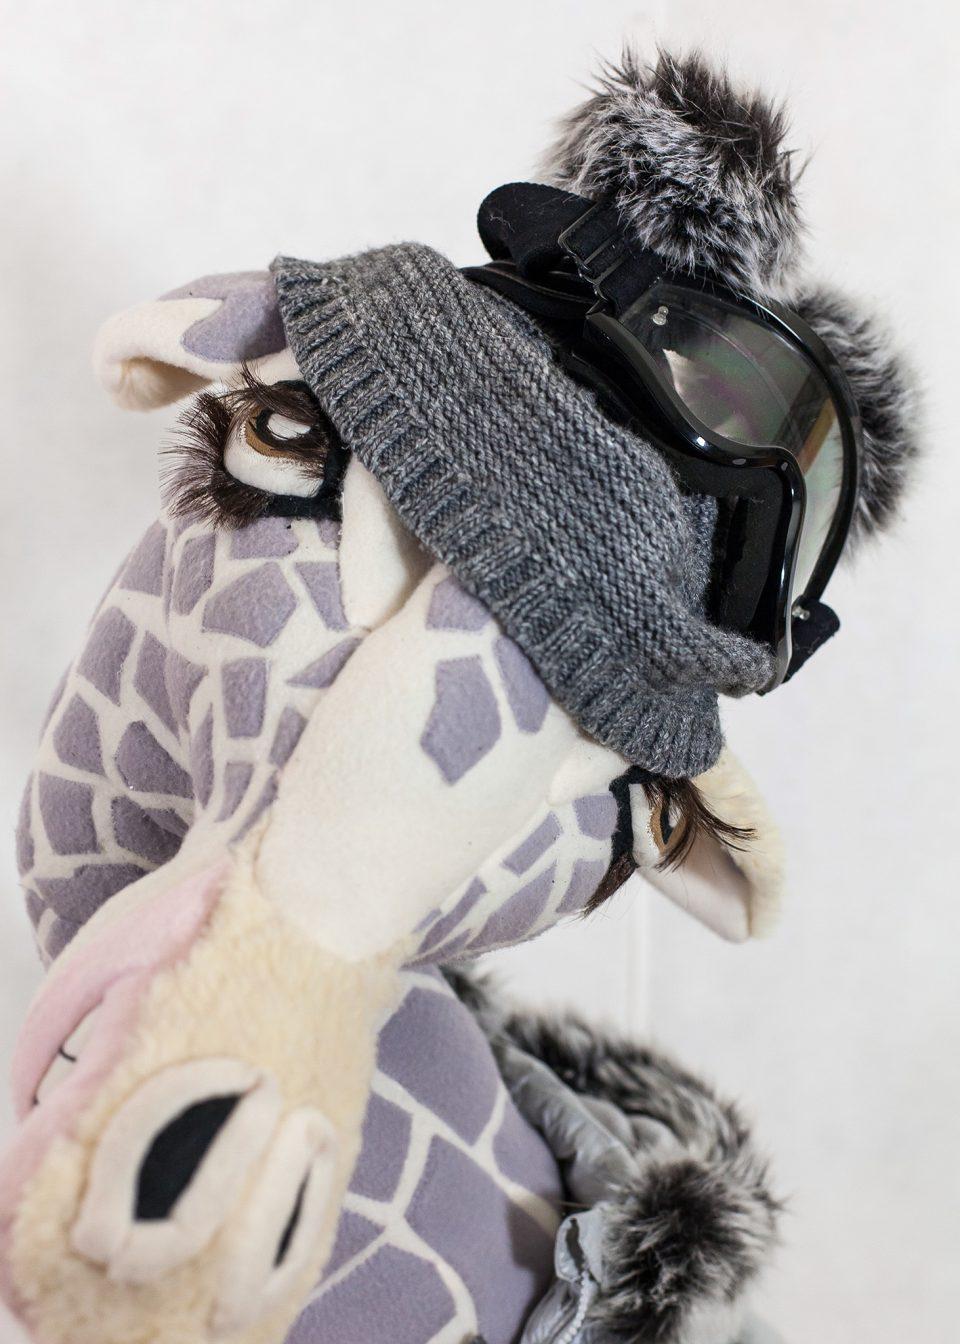 Trophée la girafe skieuse